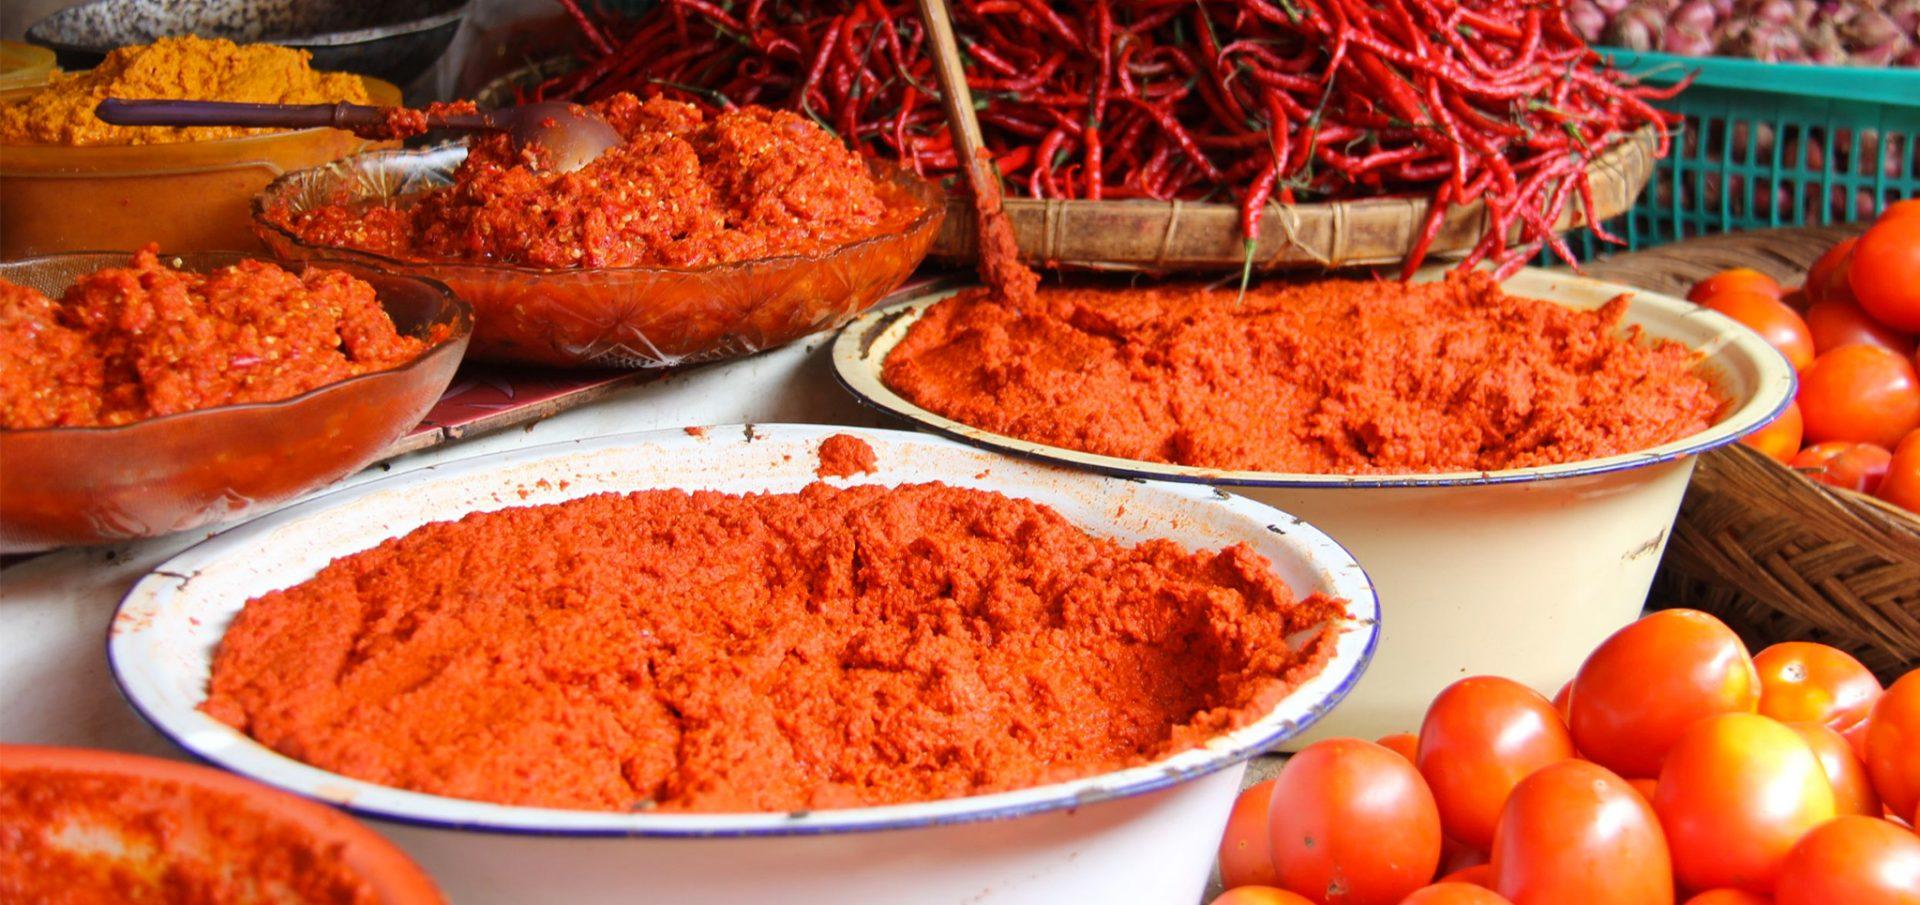 Marché indonésie, marché Sumatra